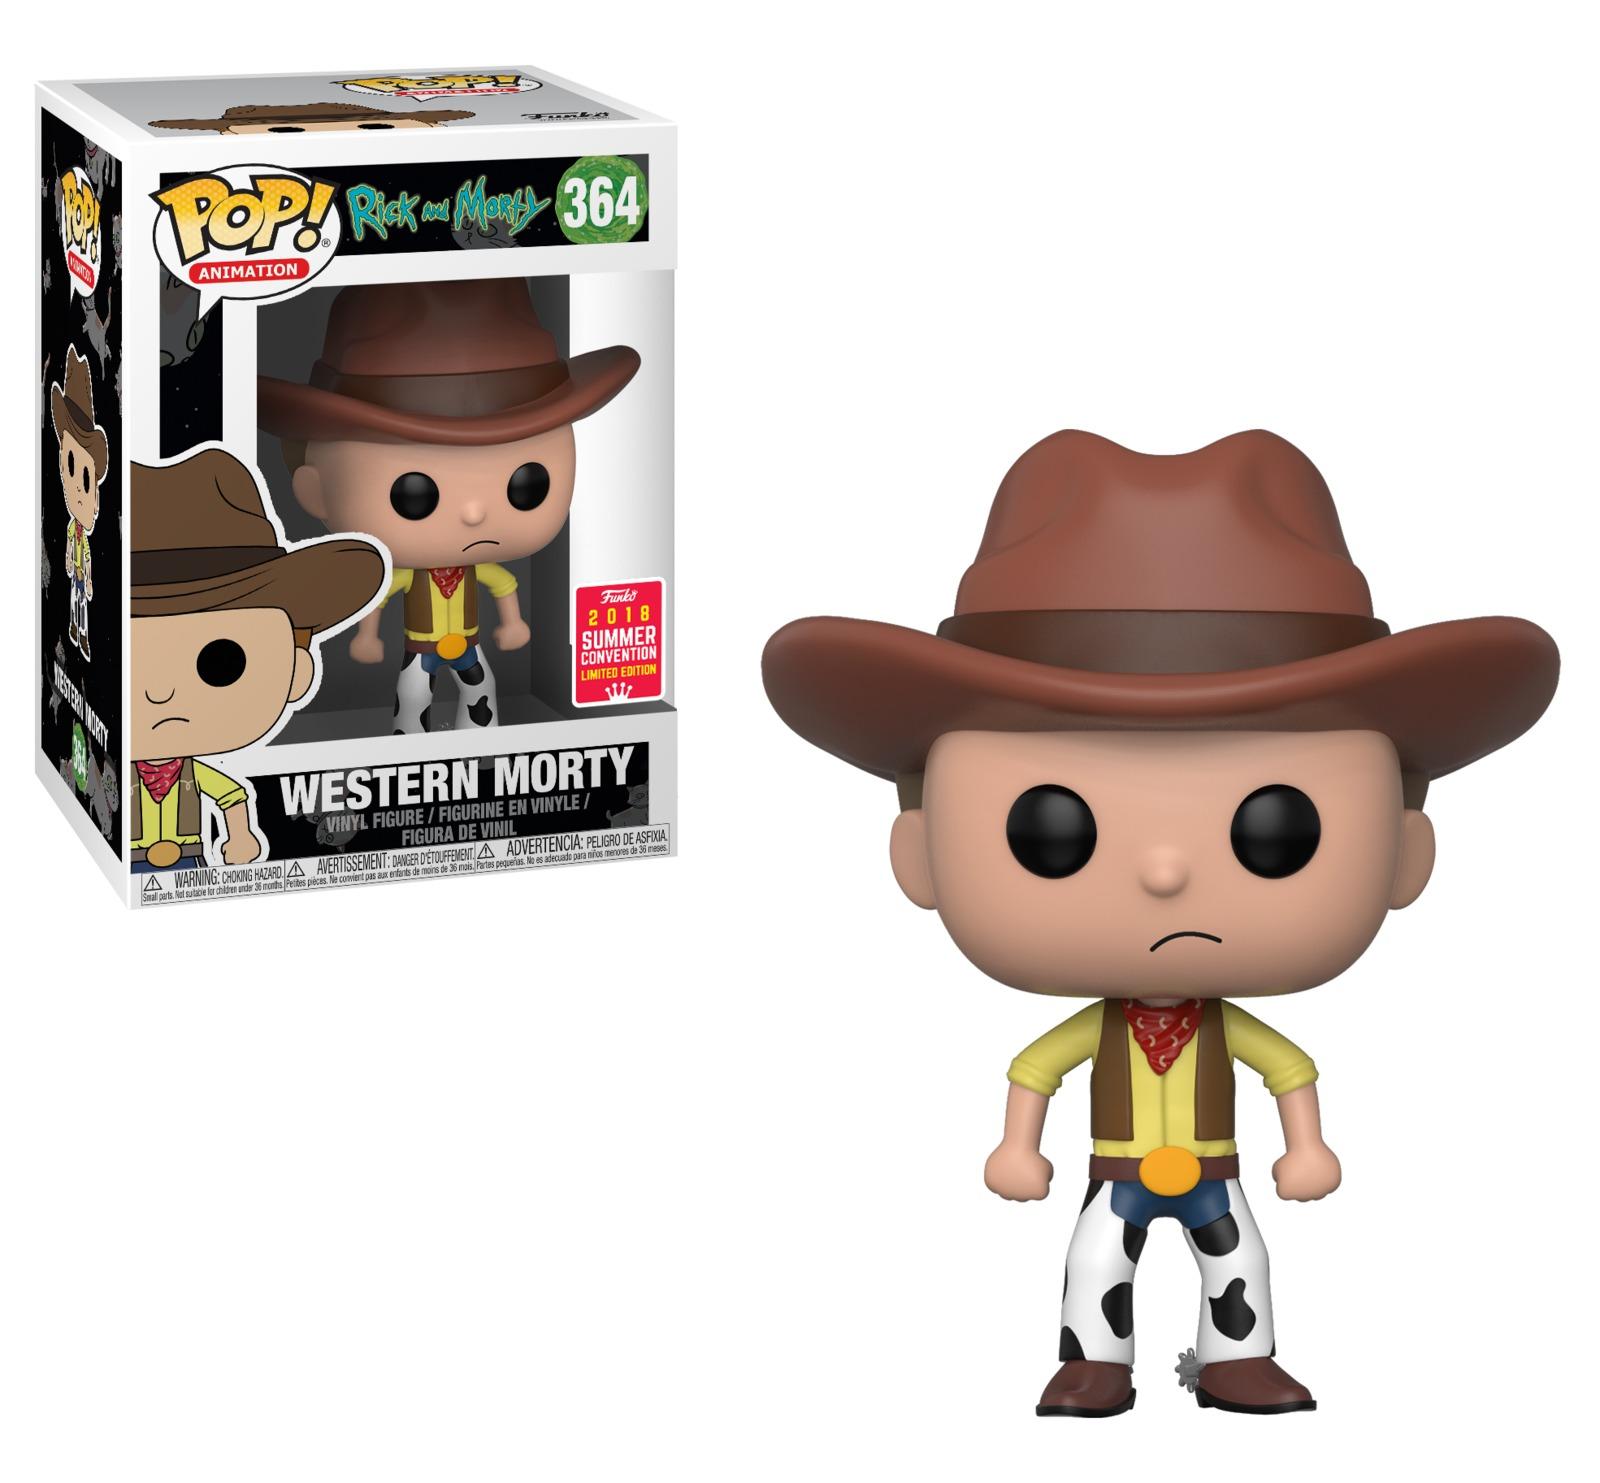 Rick & Morty - Western Morty Pop! Vinyl Figure image